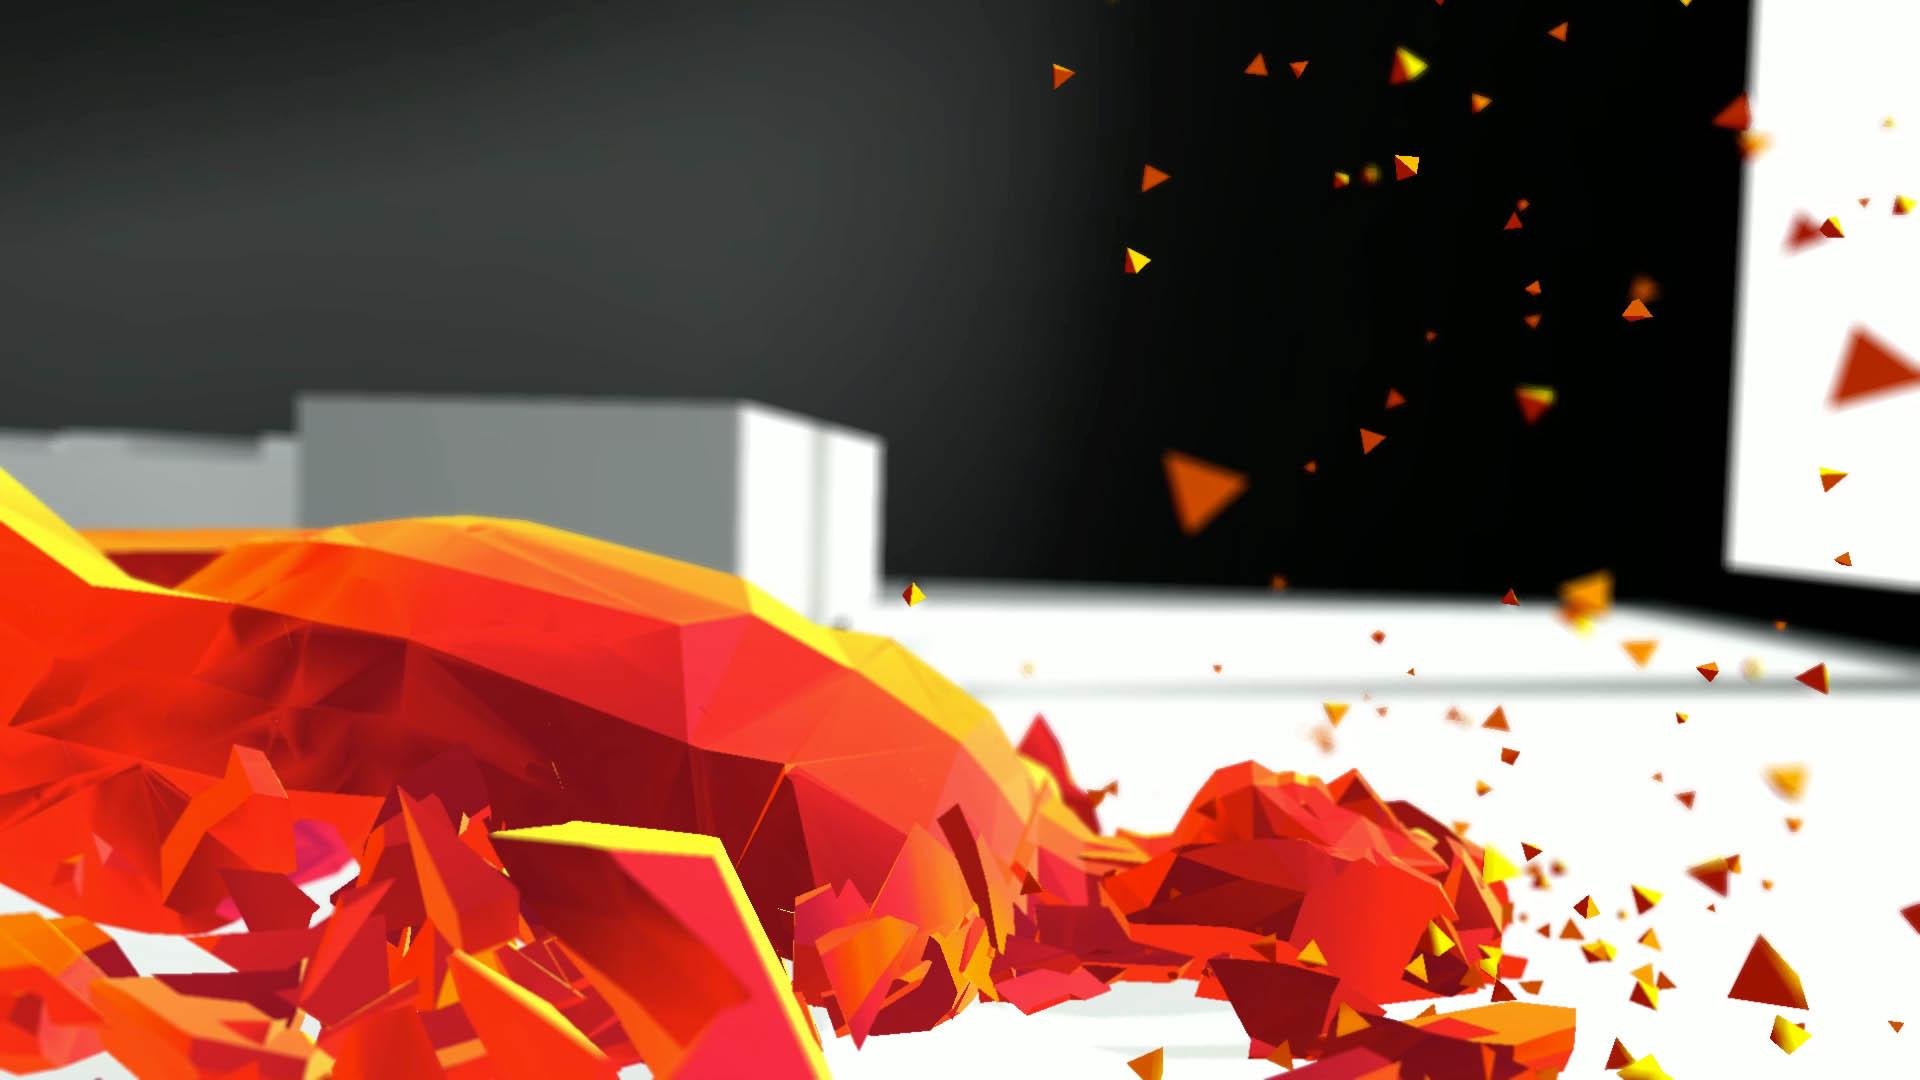 Super Hot Trailer Et Images Du Jeu Ind Xbox One